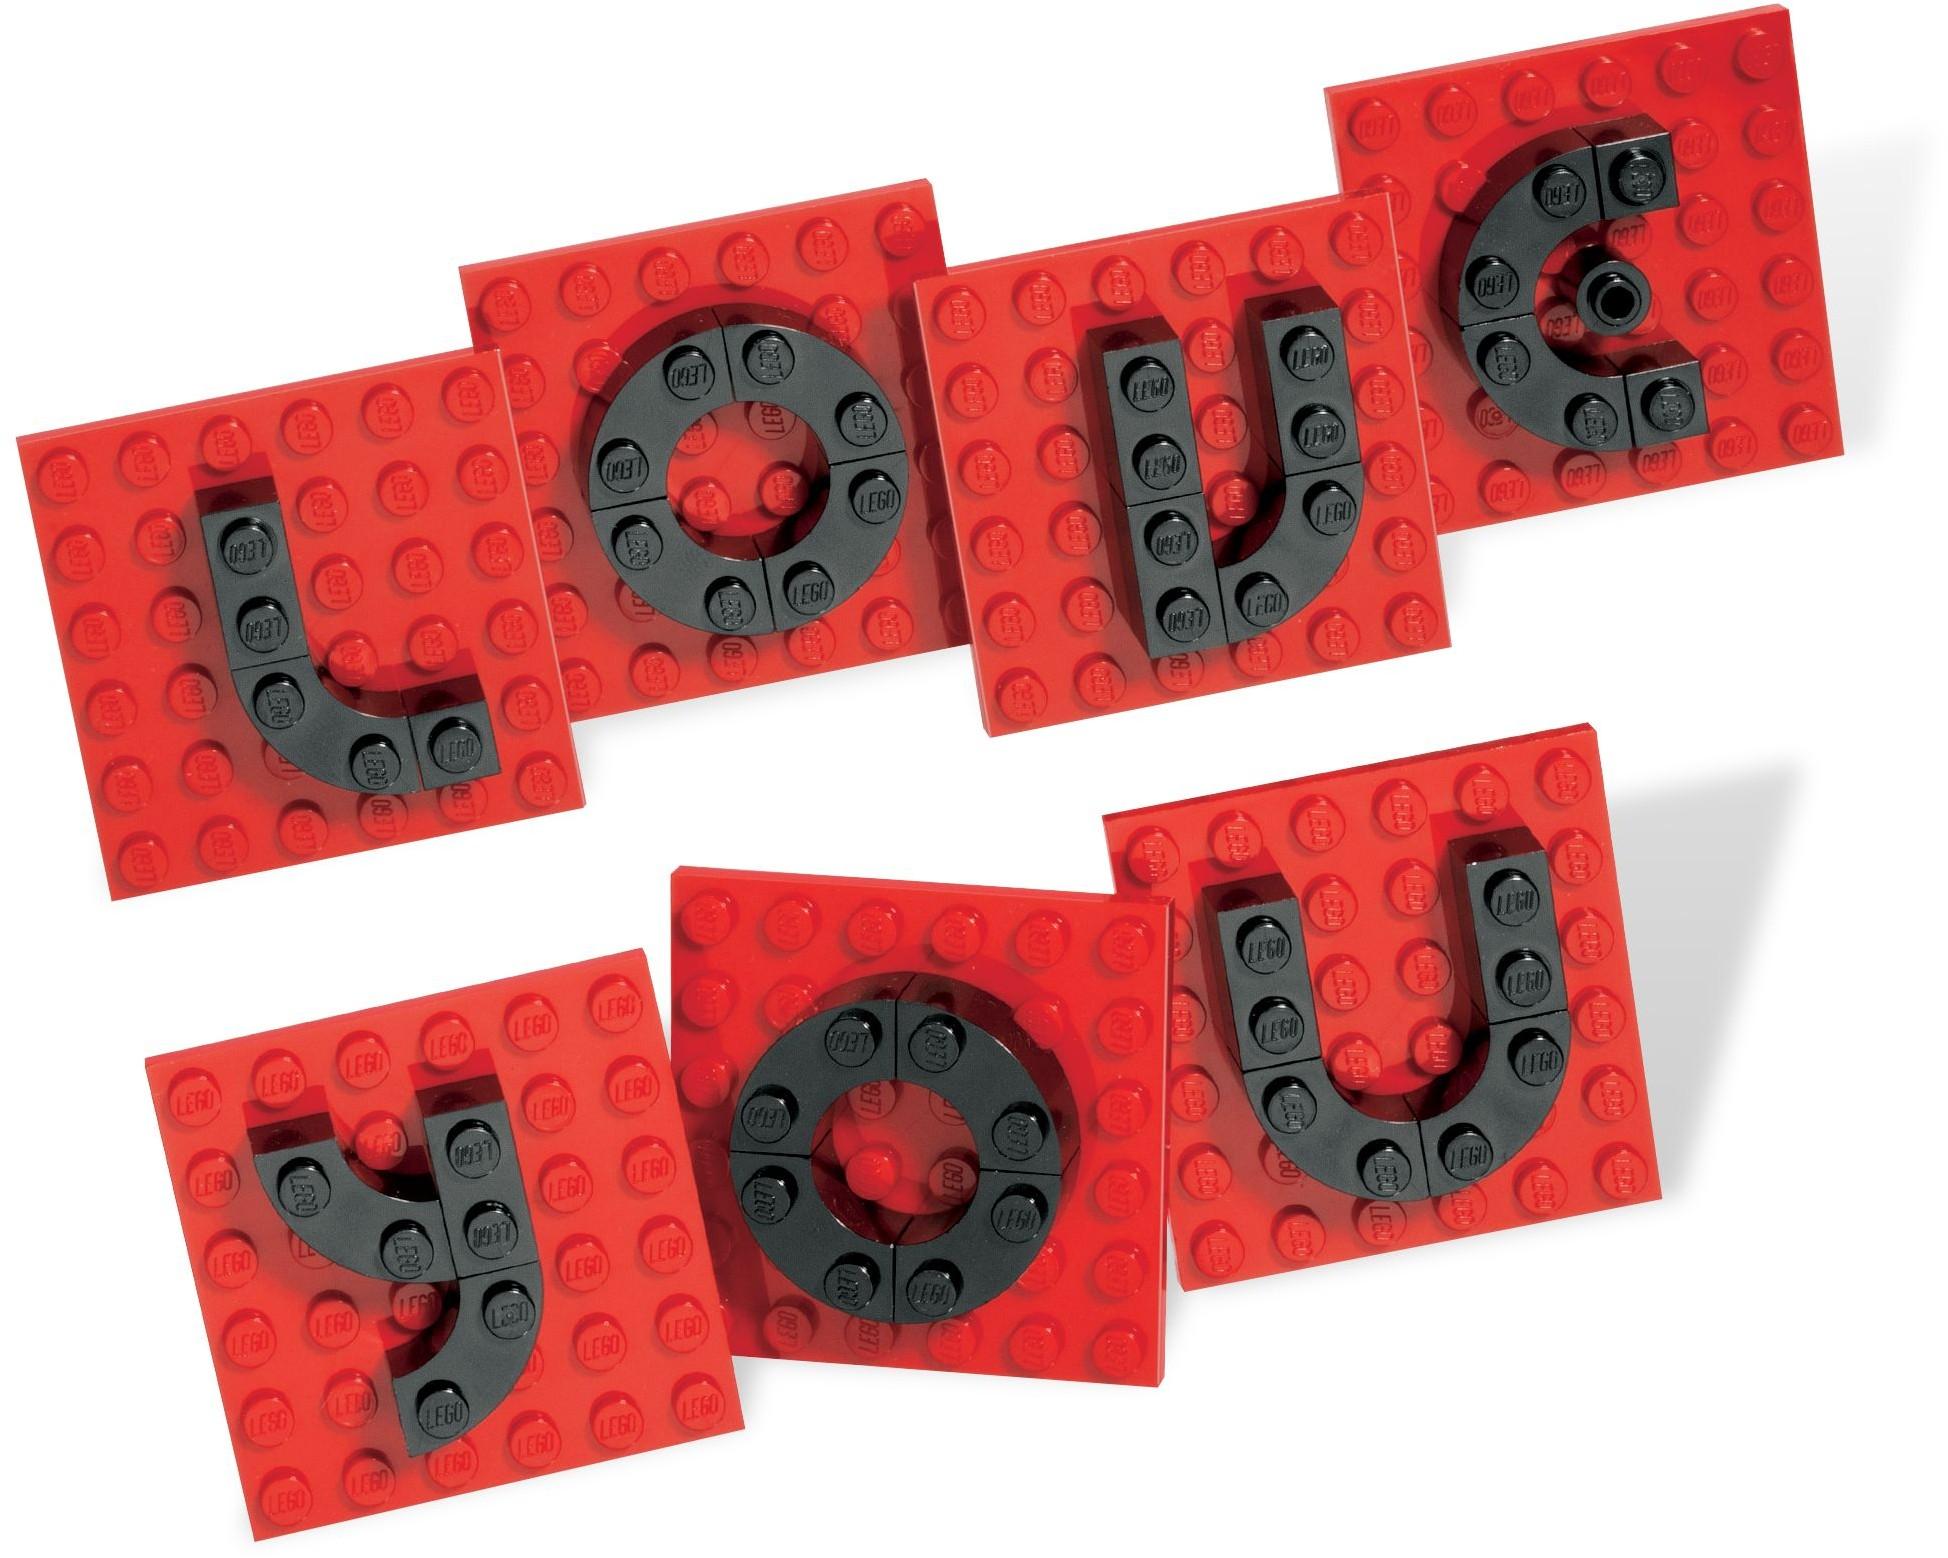 LEGO Valentine Letter Set 40016